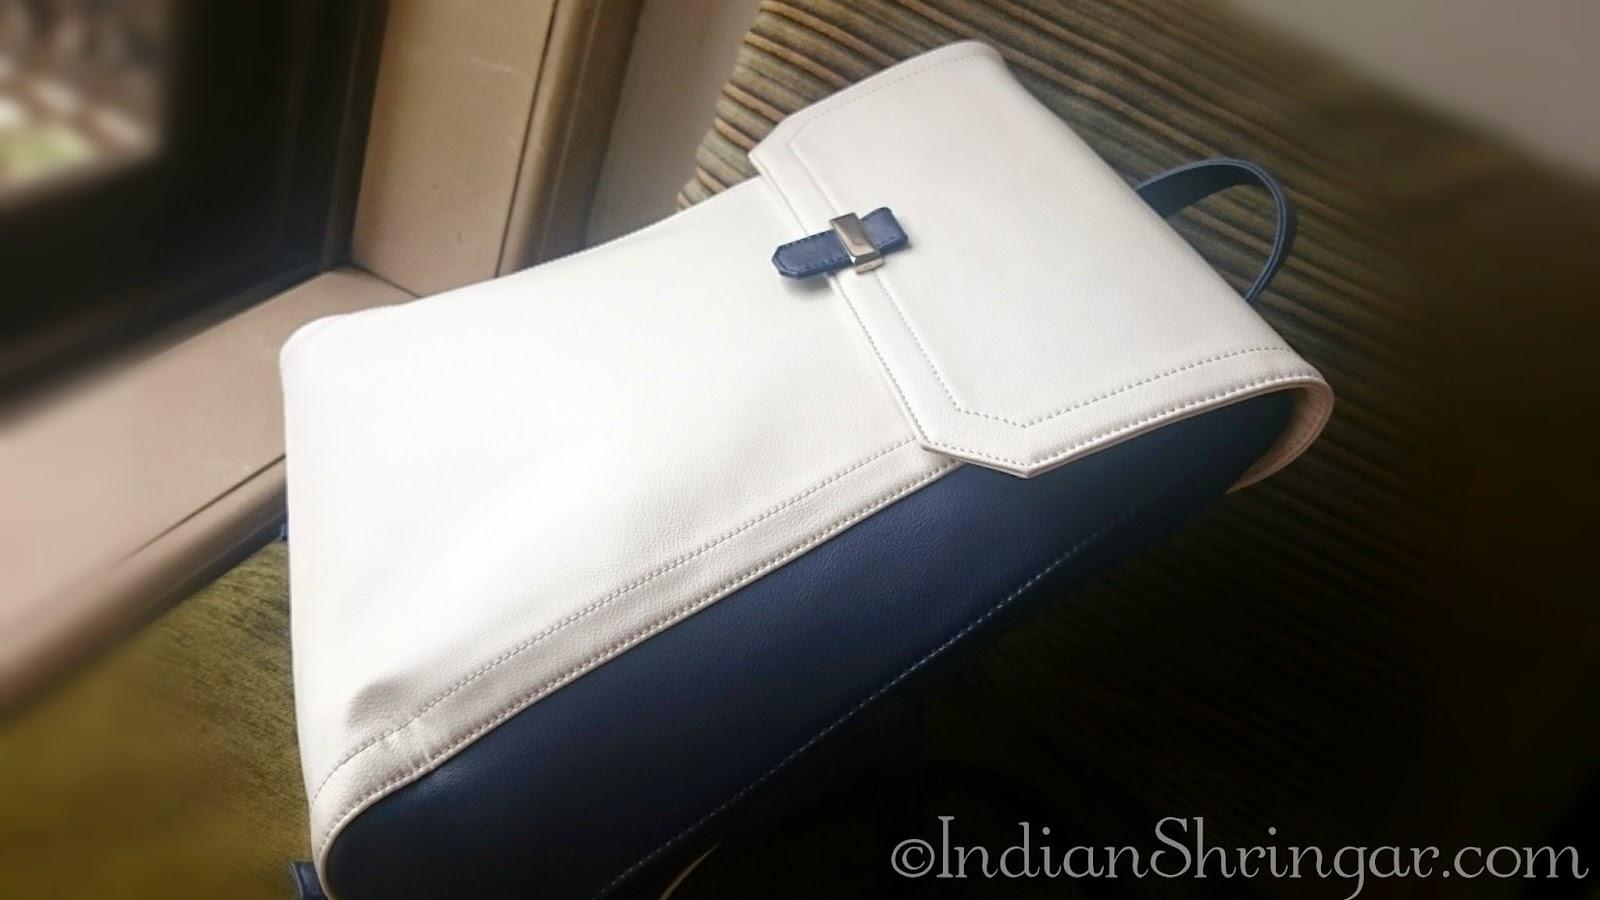 Toteteca customised bags Indian Shringar